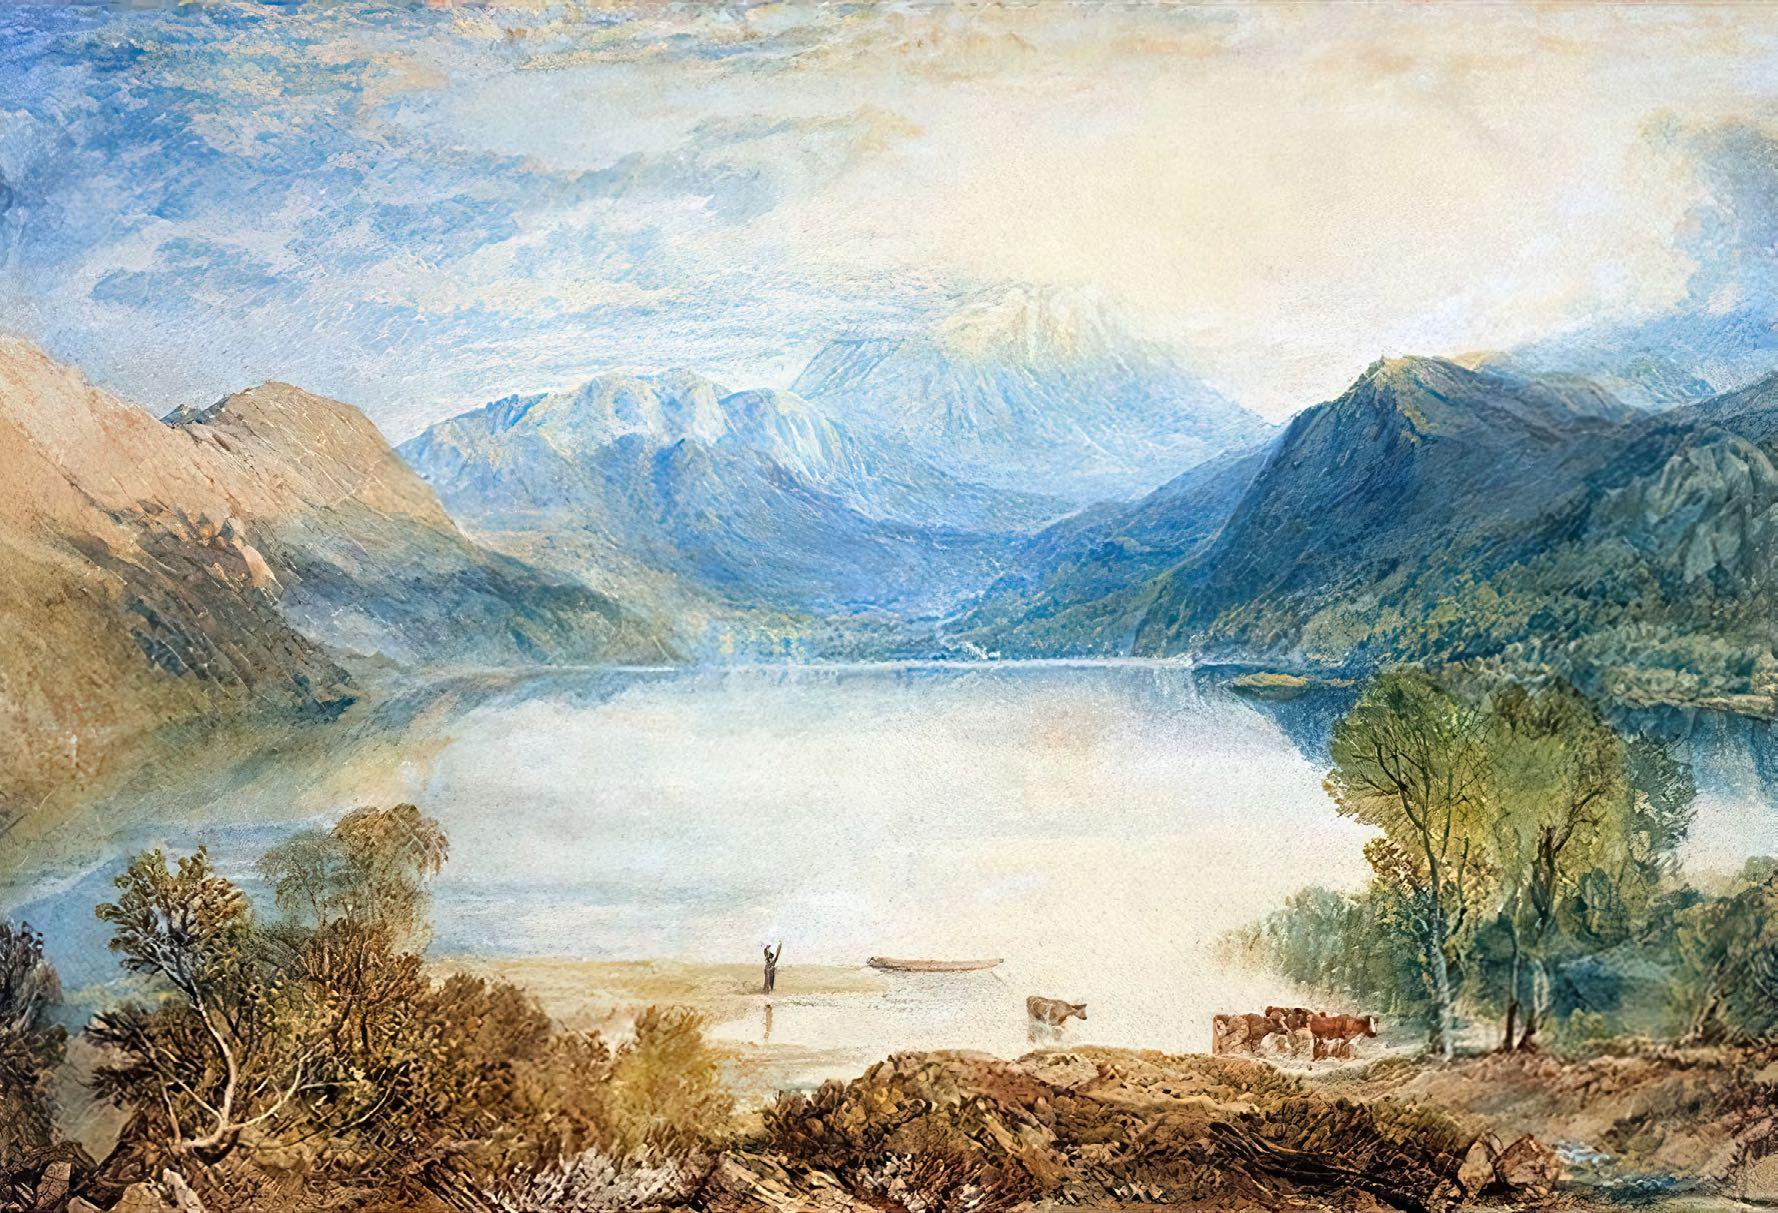 ©Wikimedia Commons Ullswater From Gowbarrow Park, 1815, by J.M.W. Turner